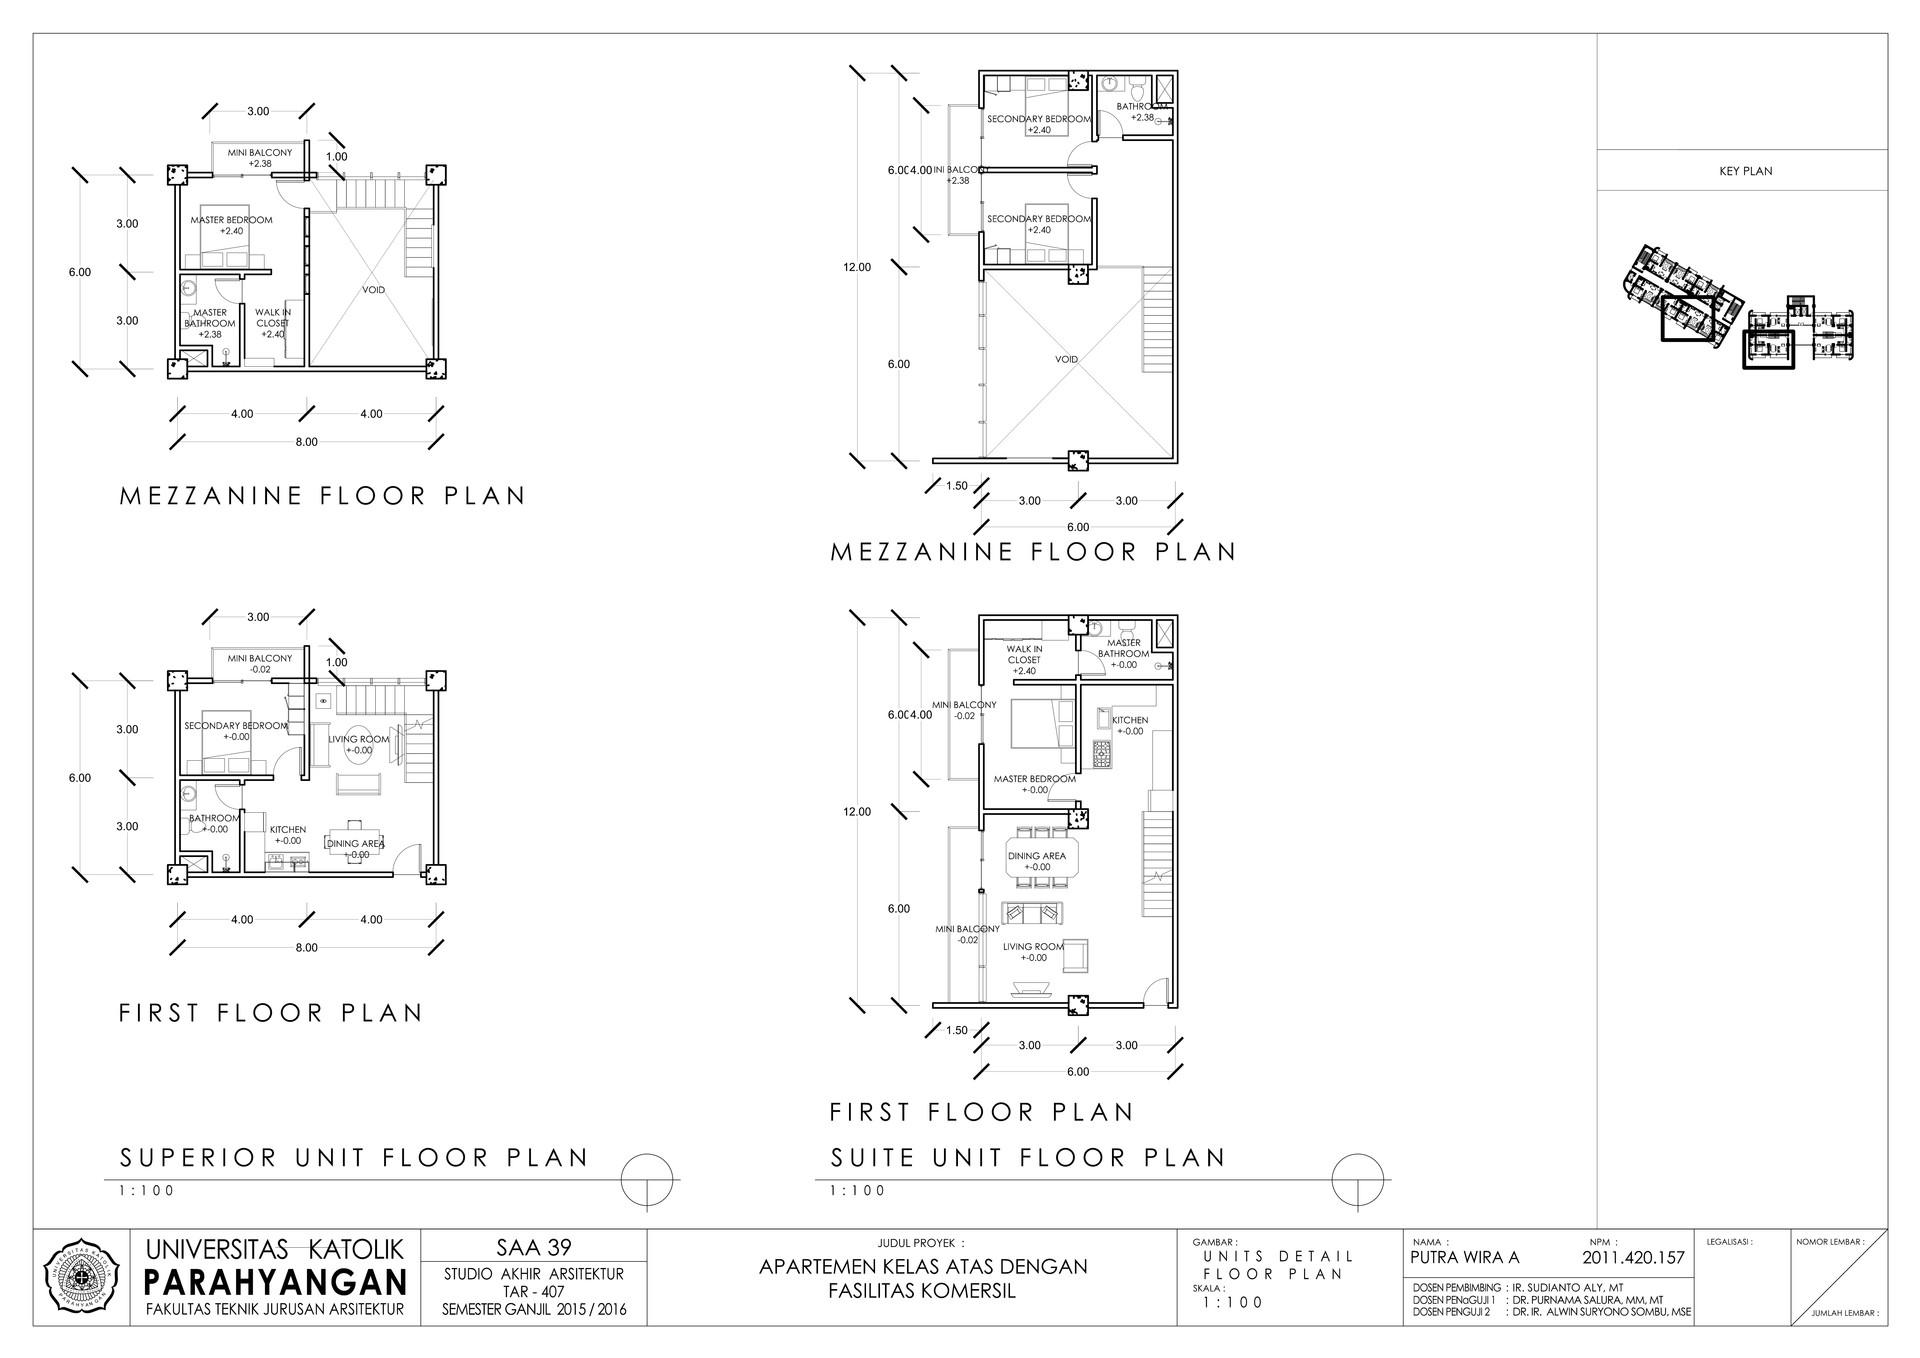 Putra wira adhiprajna 7 unit plans